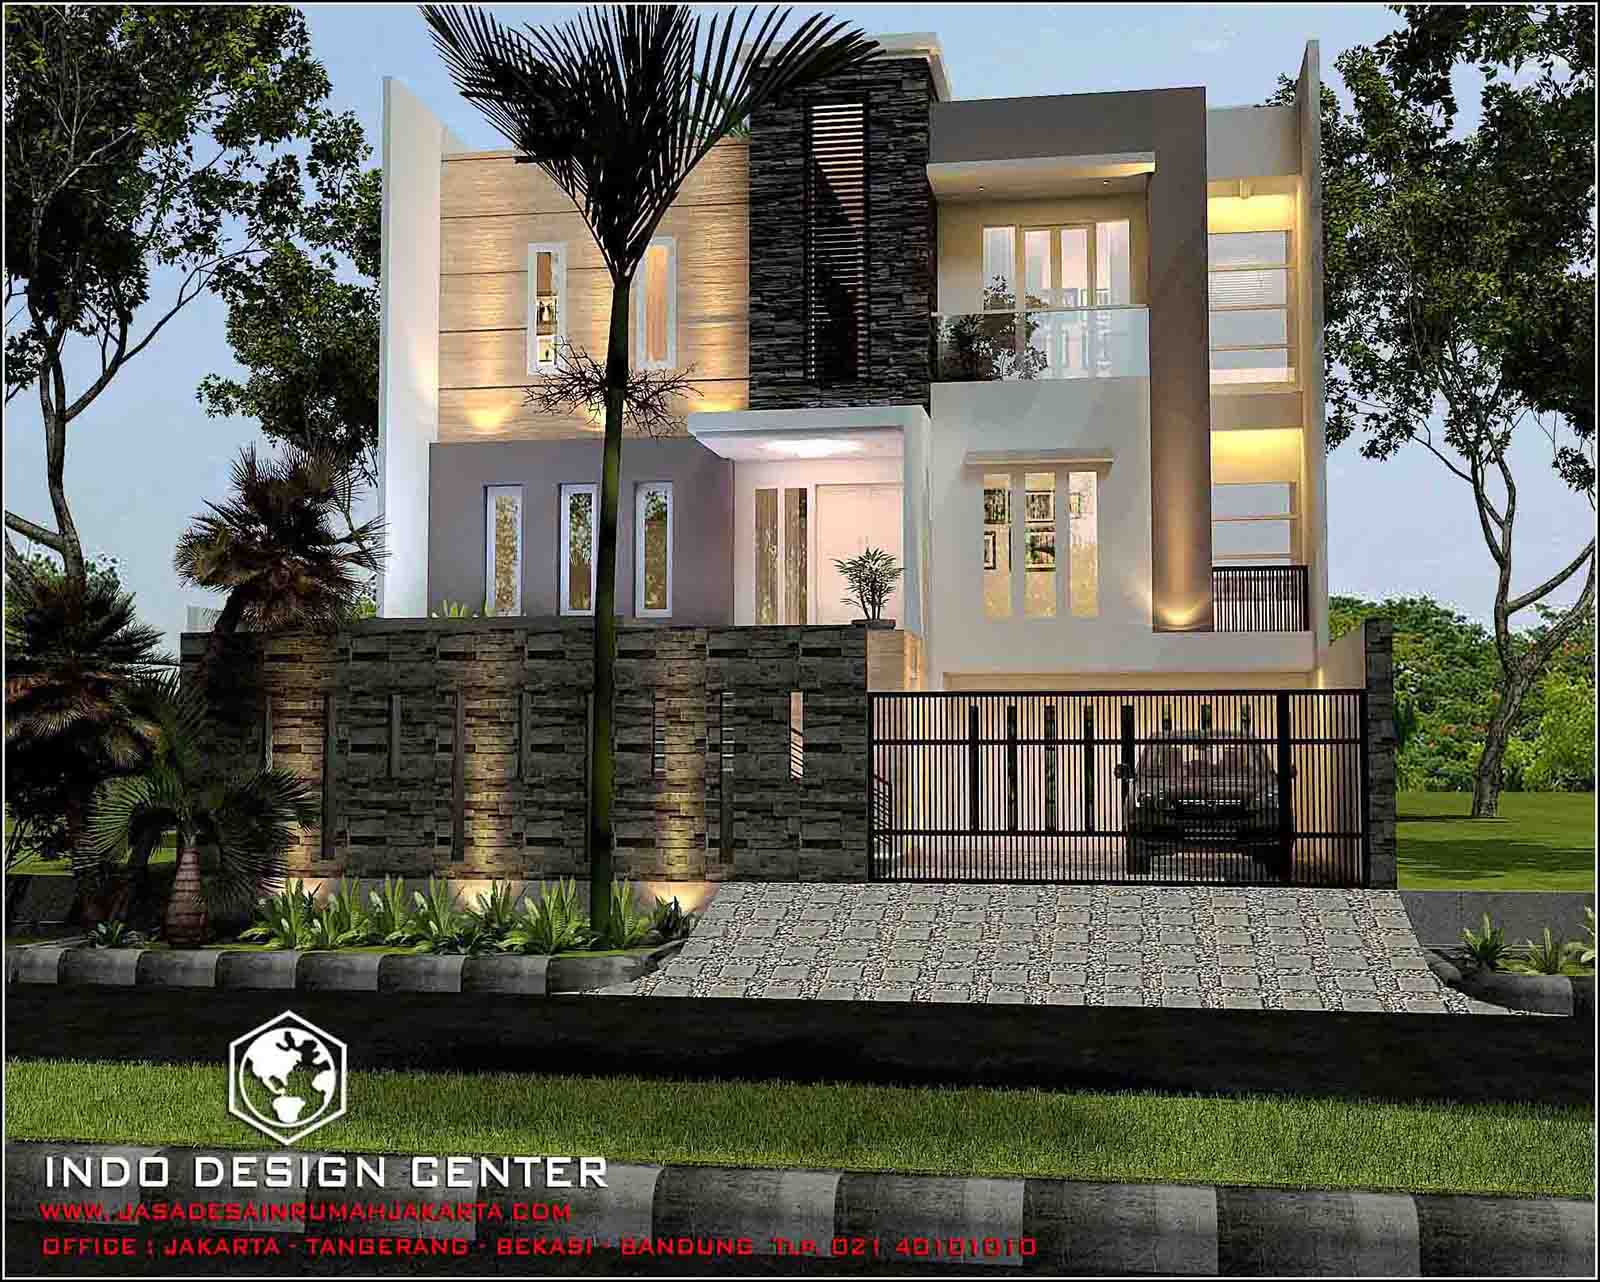 Rumah Minimalis 3 Lantai Tampak 2 Lantai Harga Jasa Desain